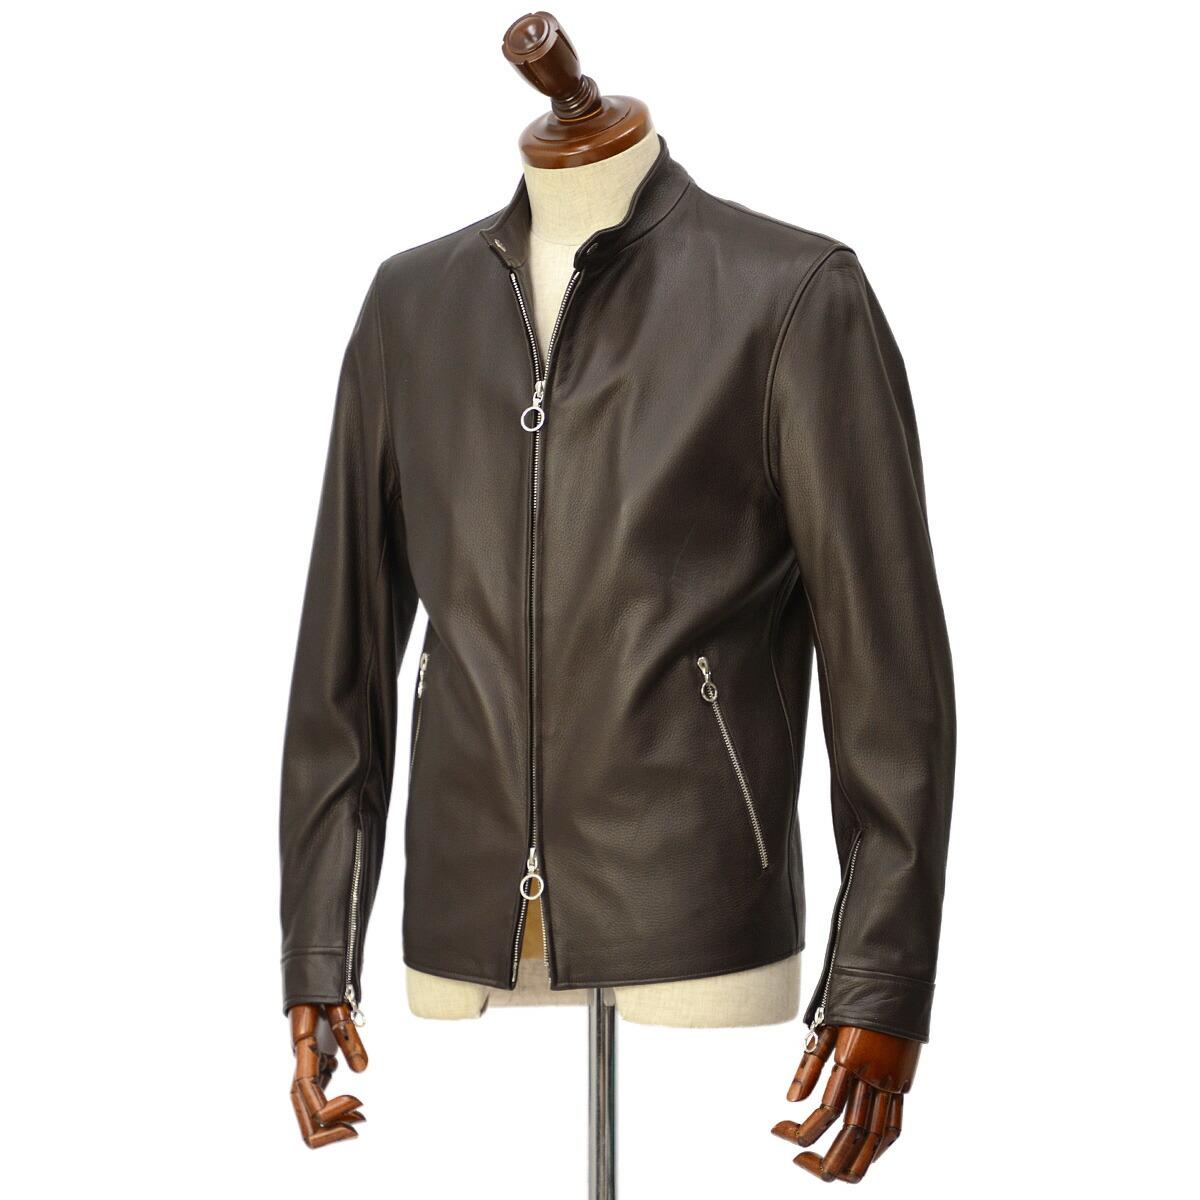 SERAPHIN【セラファン】 シングルライダースジャケット BIKER ANDY 129 00 CERF MARRON ディアスキン ダークブラウン